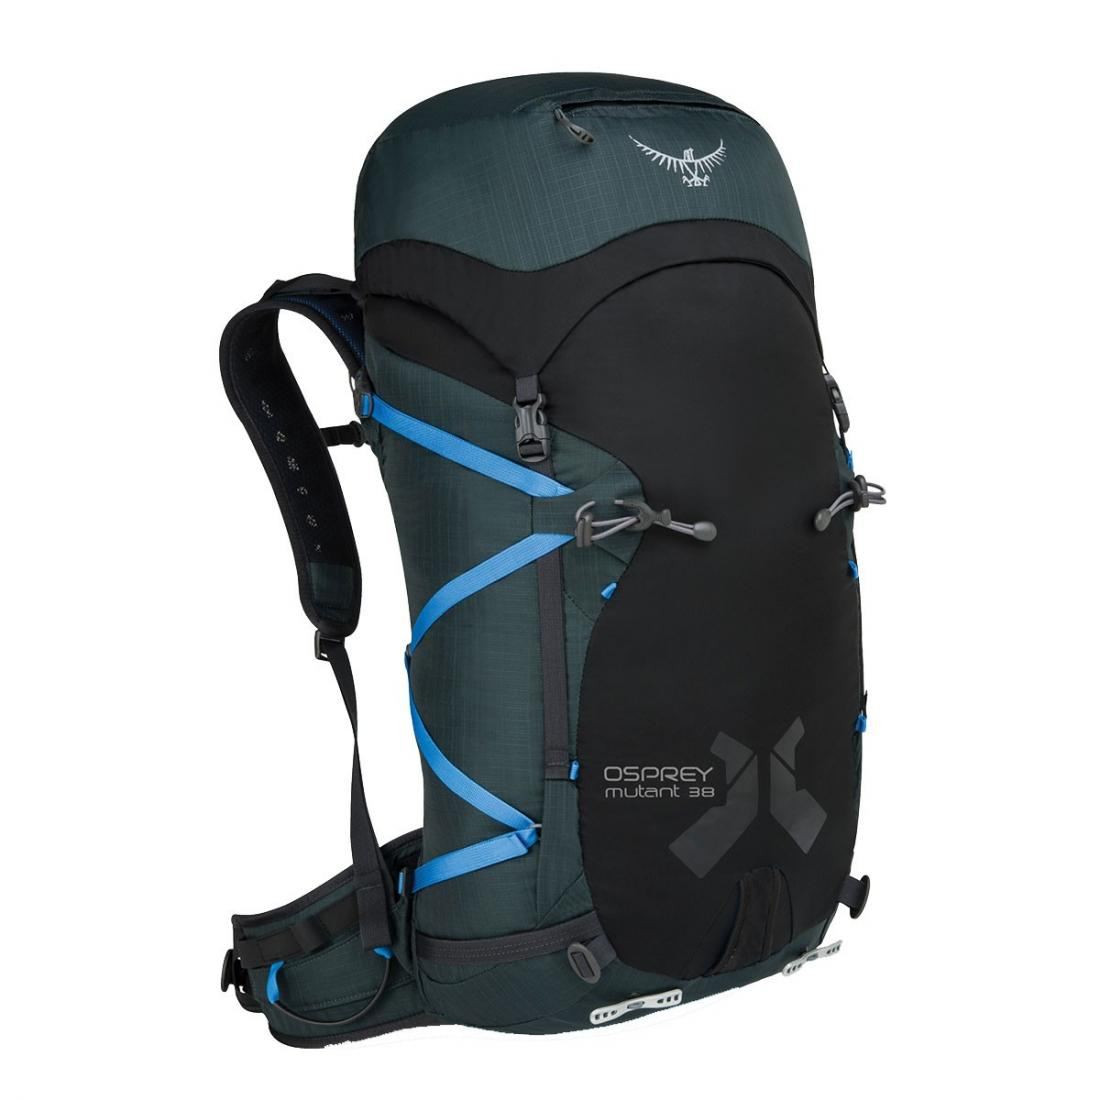 купить Osprey Рюкзак Mutant 38 (S/M, Gritstone Black, ,) недорого